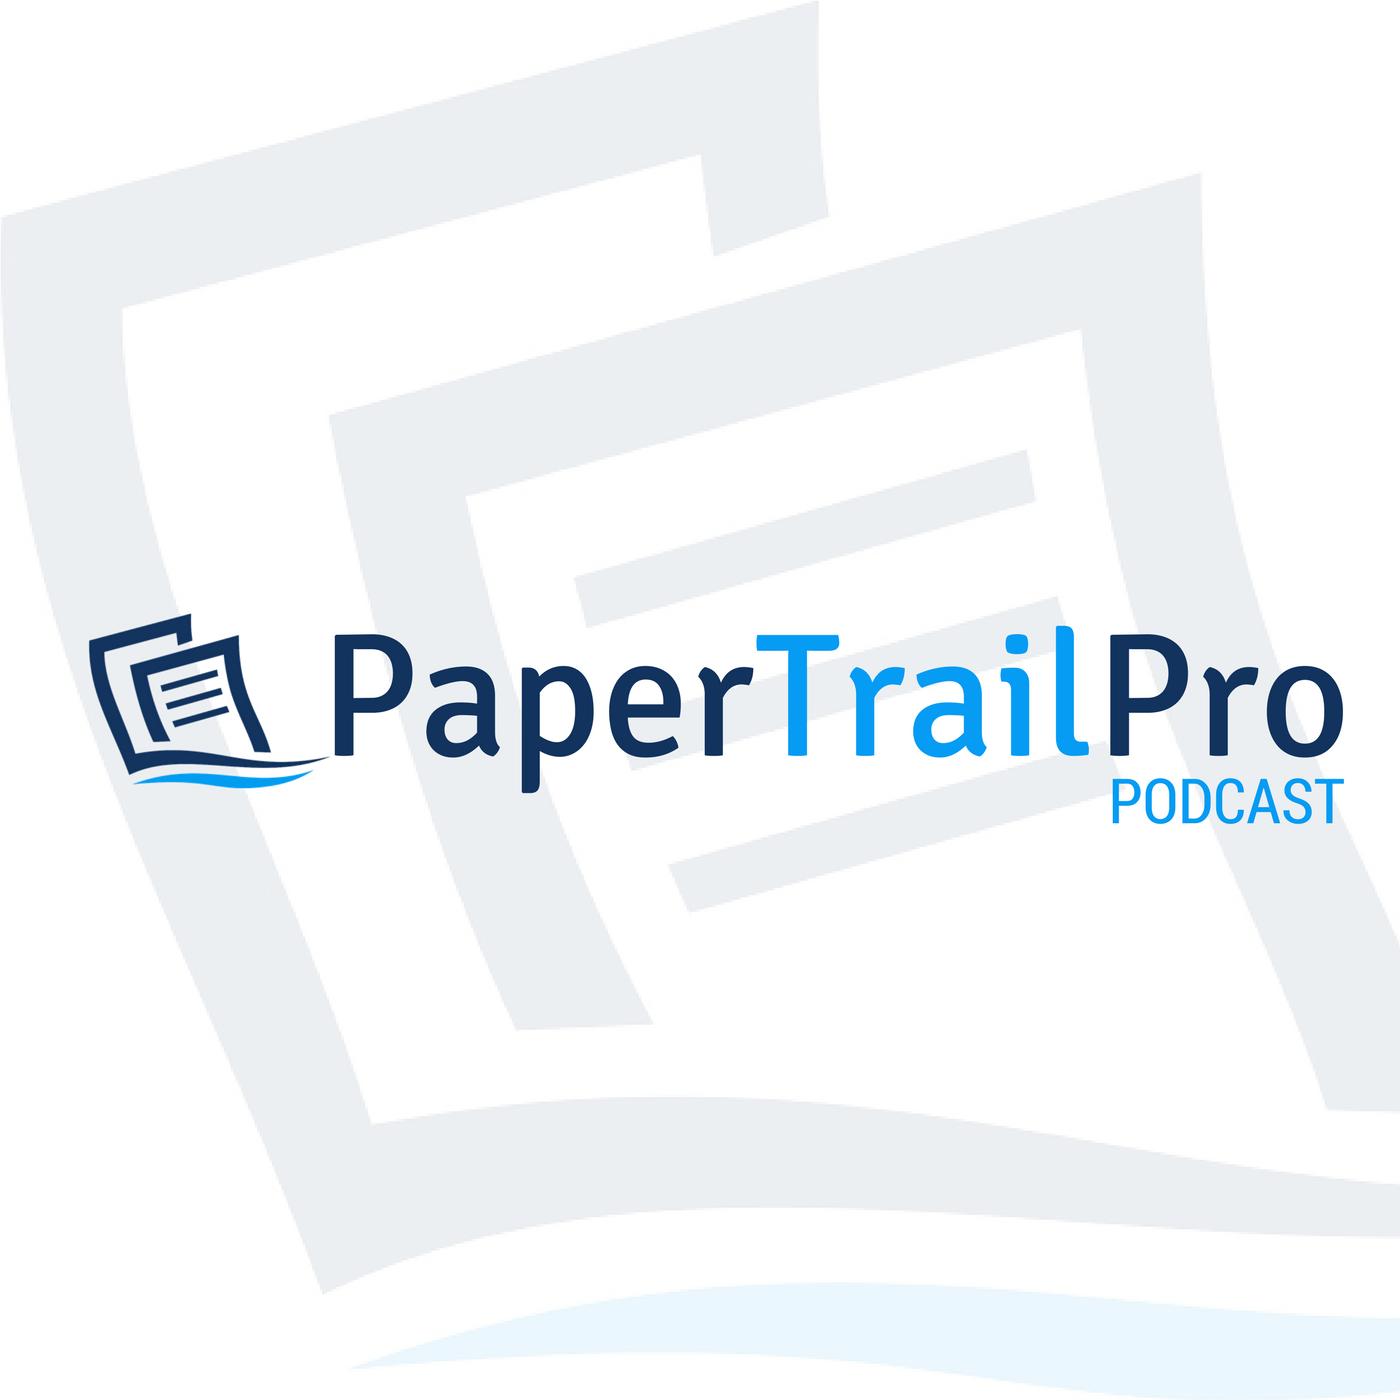 Paper Trail Pro